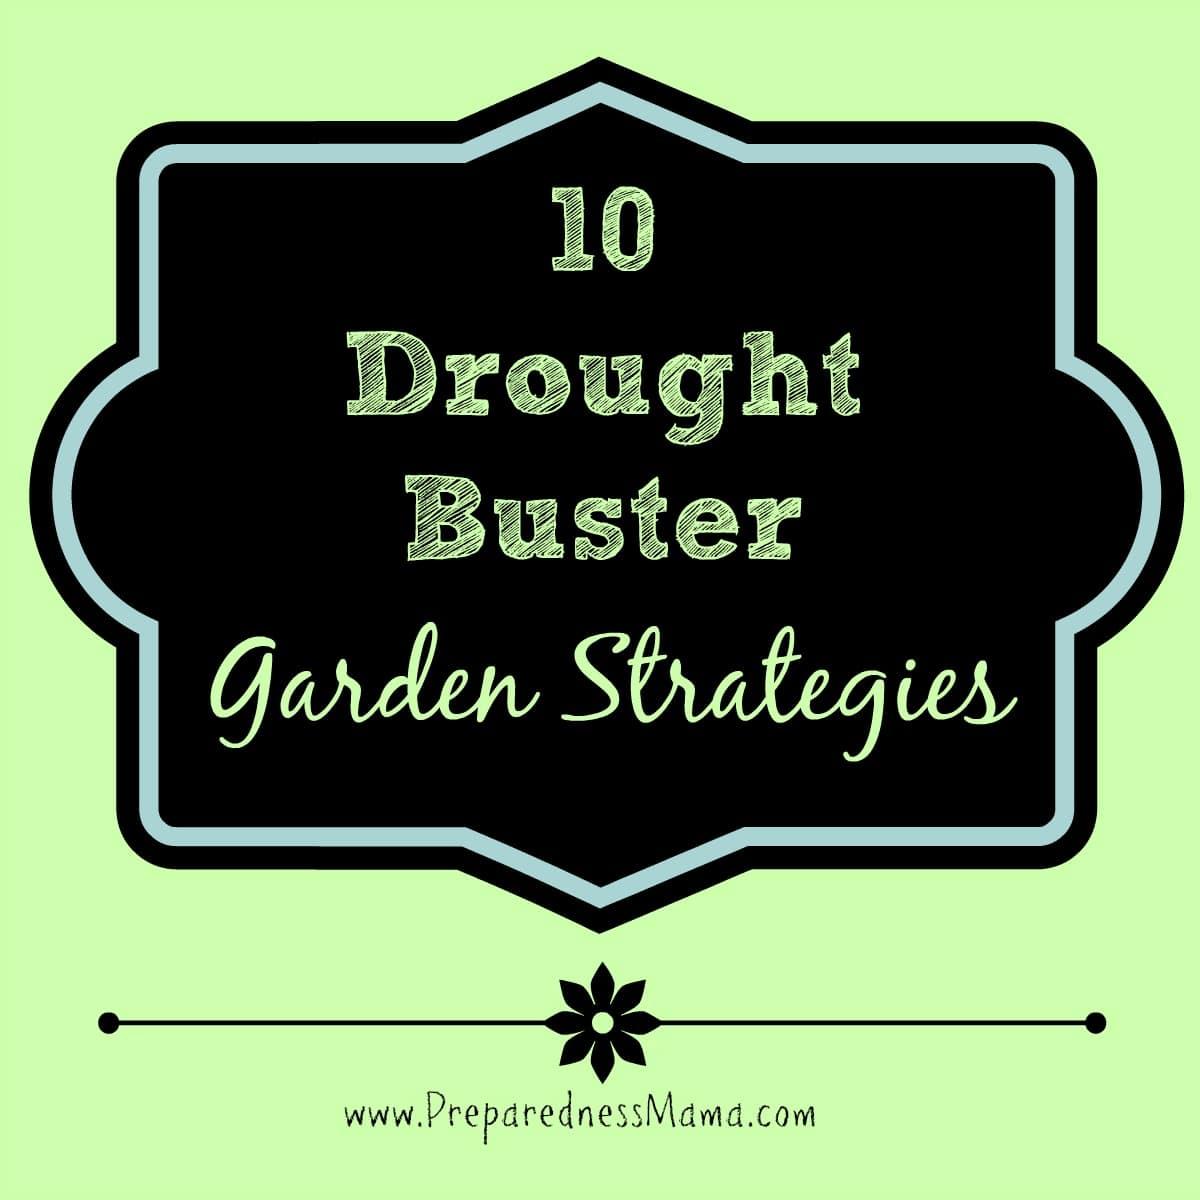 10 Drought Buster Gardening Strategies | PreparednessMama